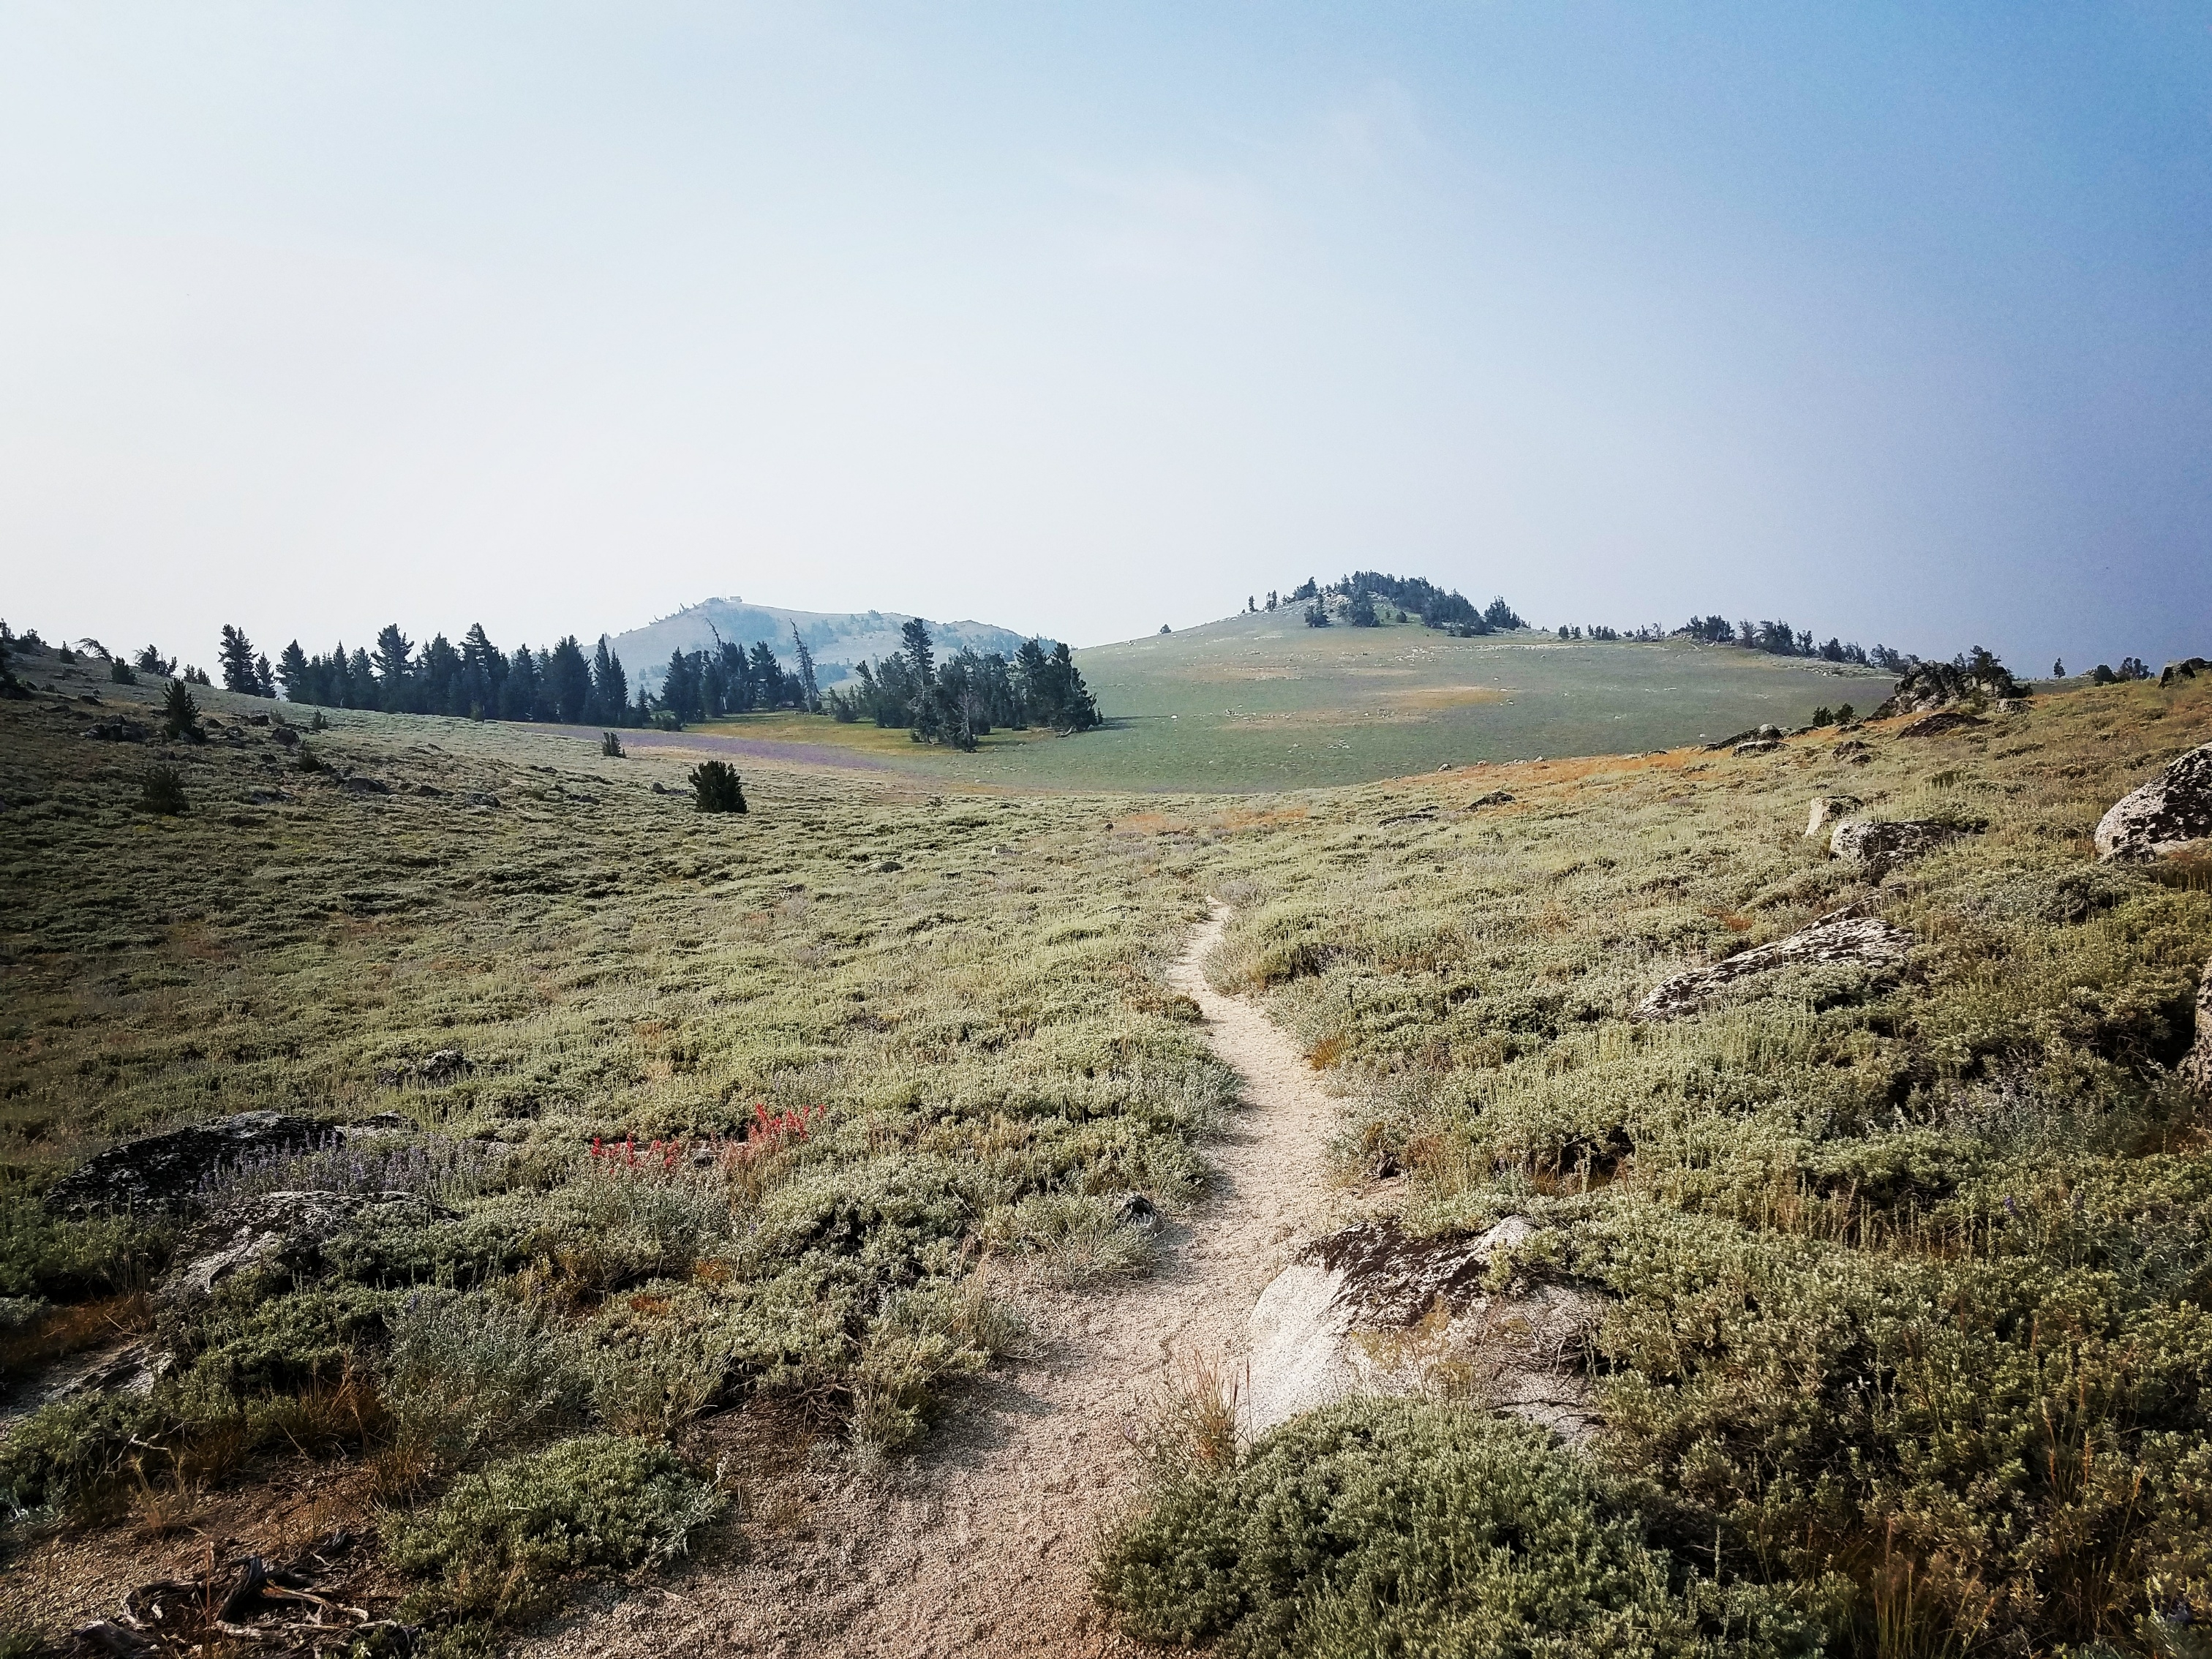 Tahoe Rim Trail - Backpacking Light